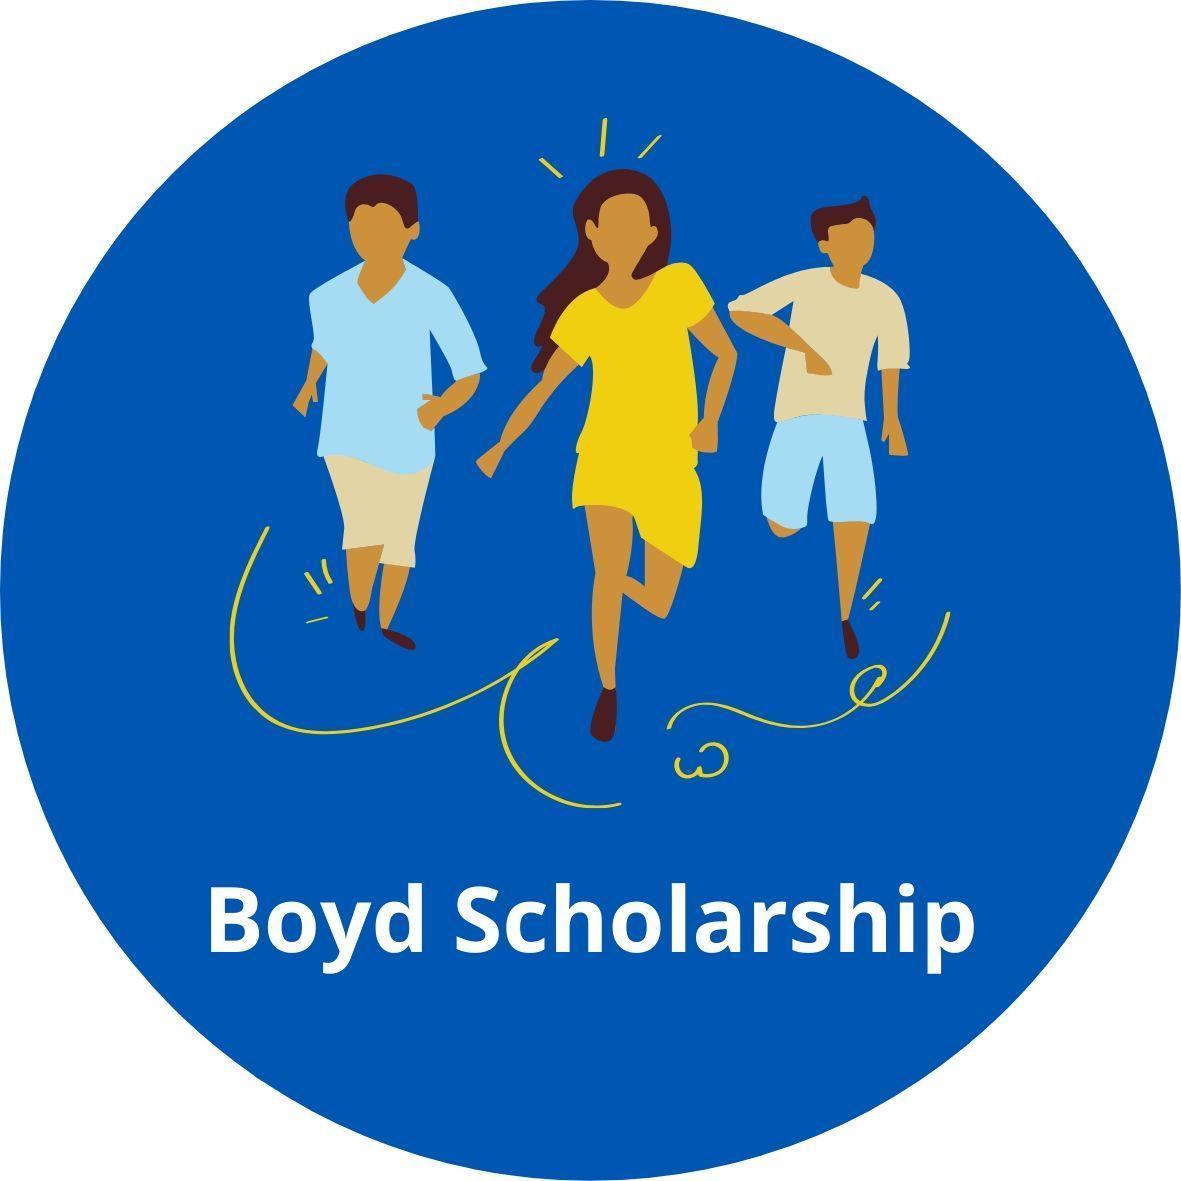 Boyd Scholarship